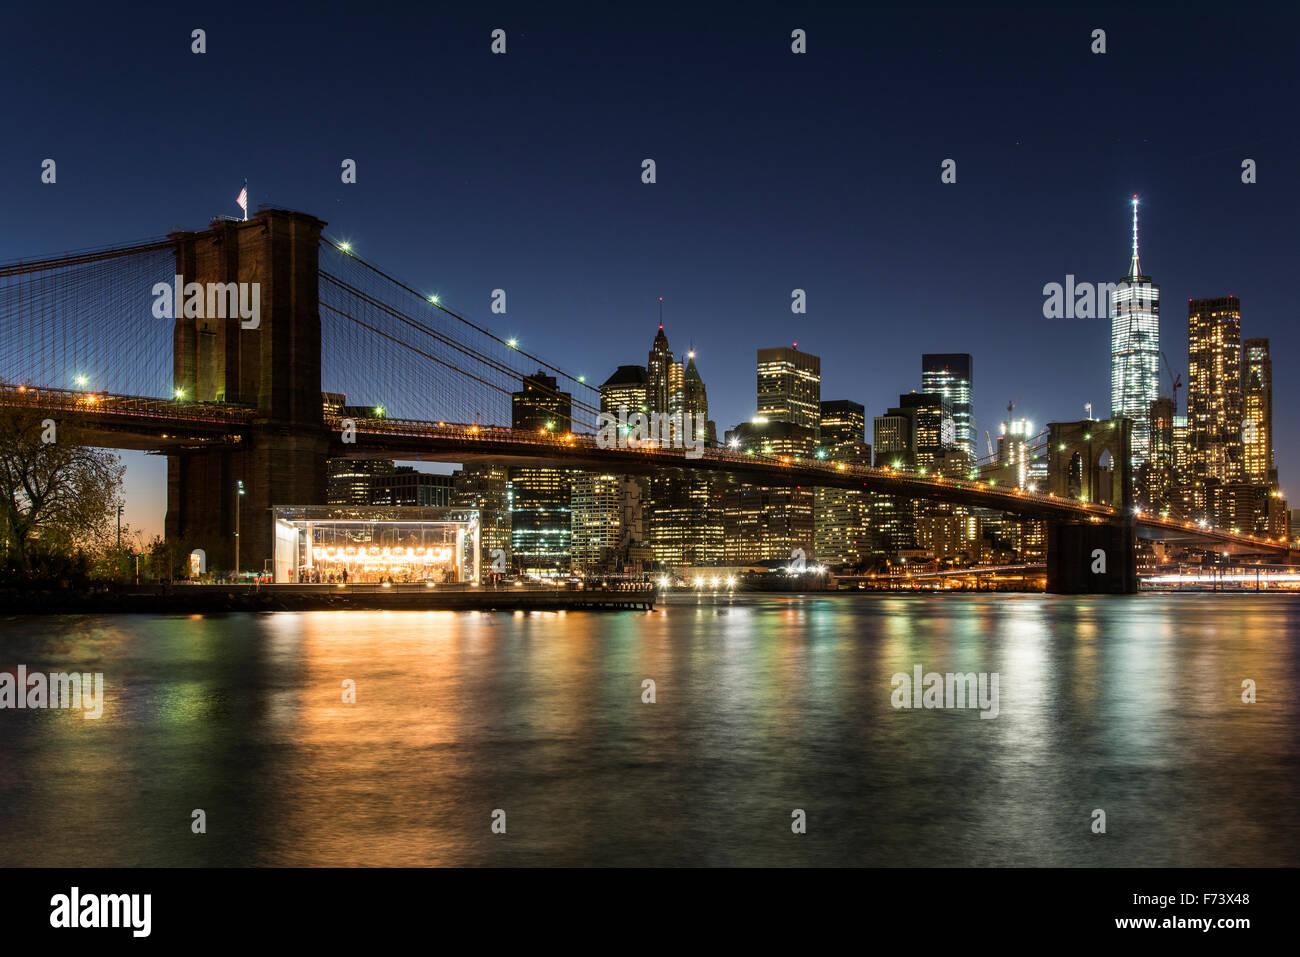 Night view of Brooklyn Bridge with Lower Manhattan skyline, Brooklyn, New York, USA Stock Photo